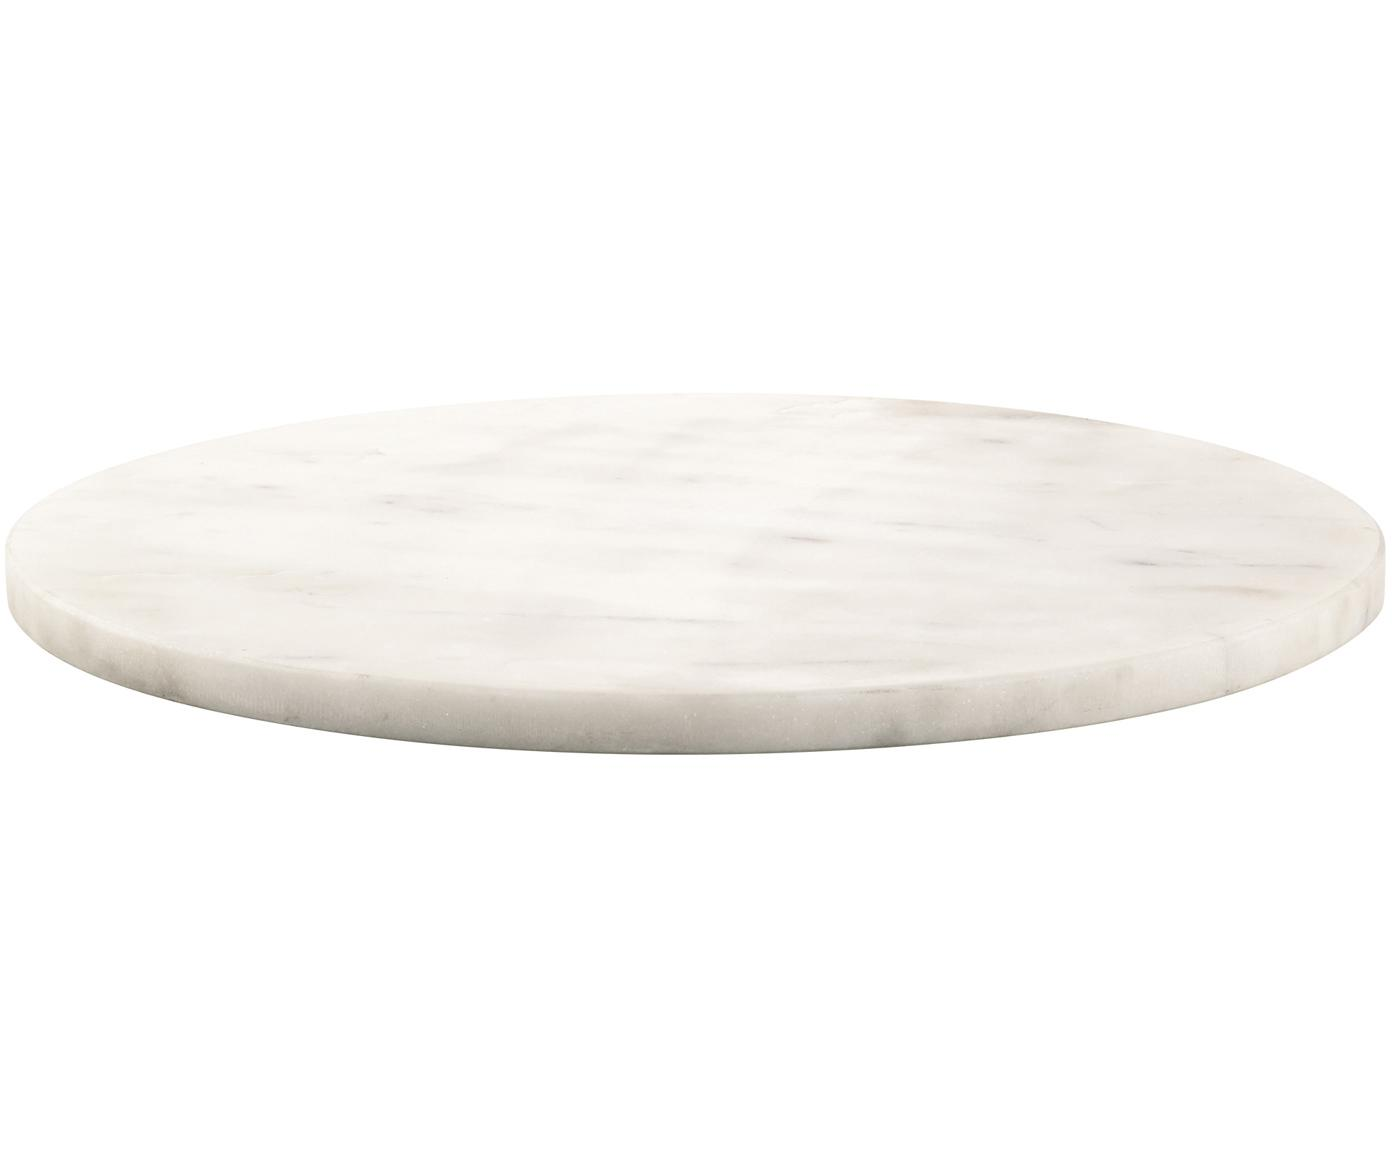 Fuente de mármol Minu, Mármol, Blanco, Ø 30 cm